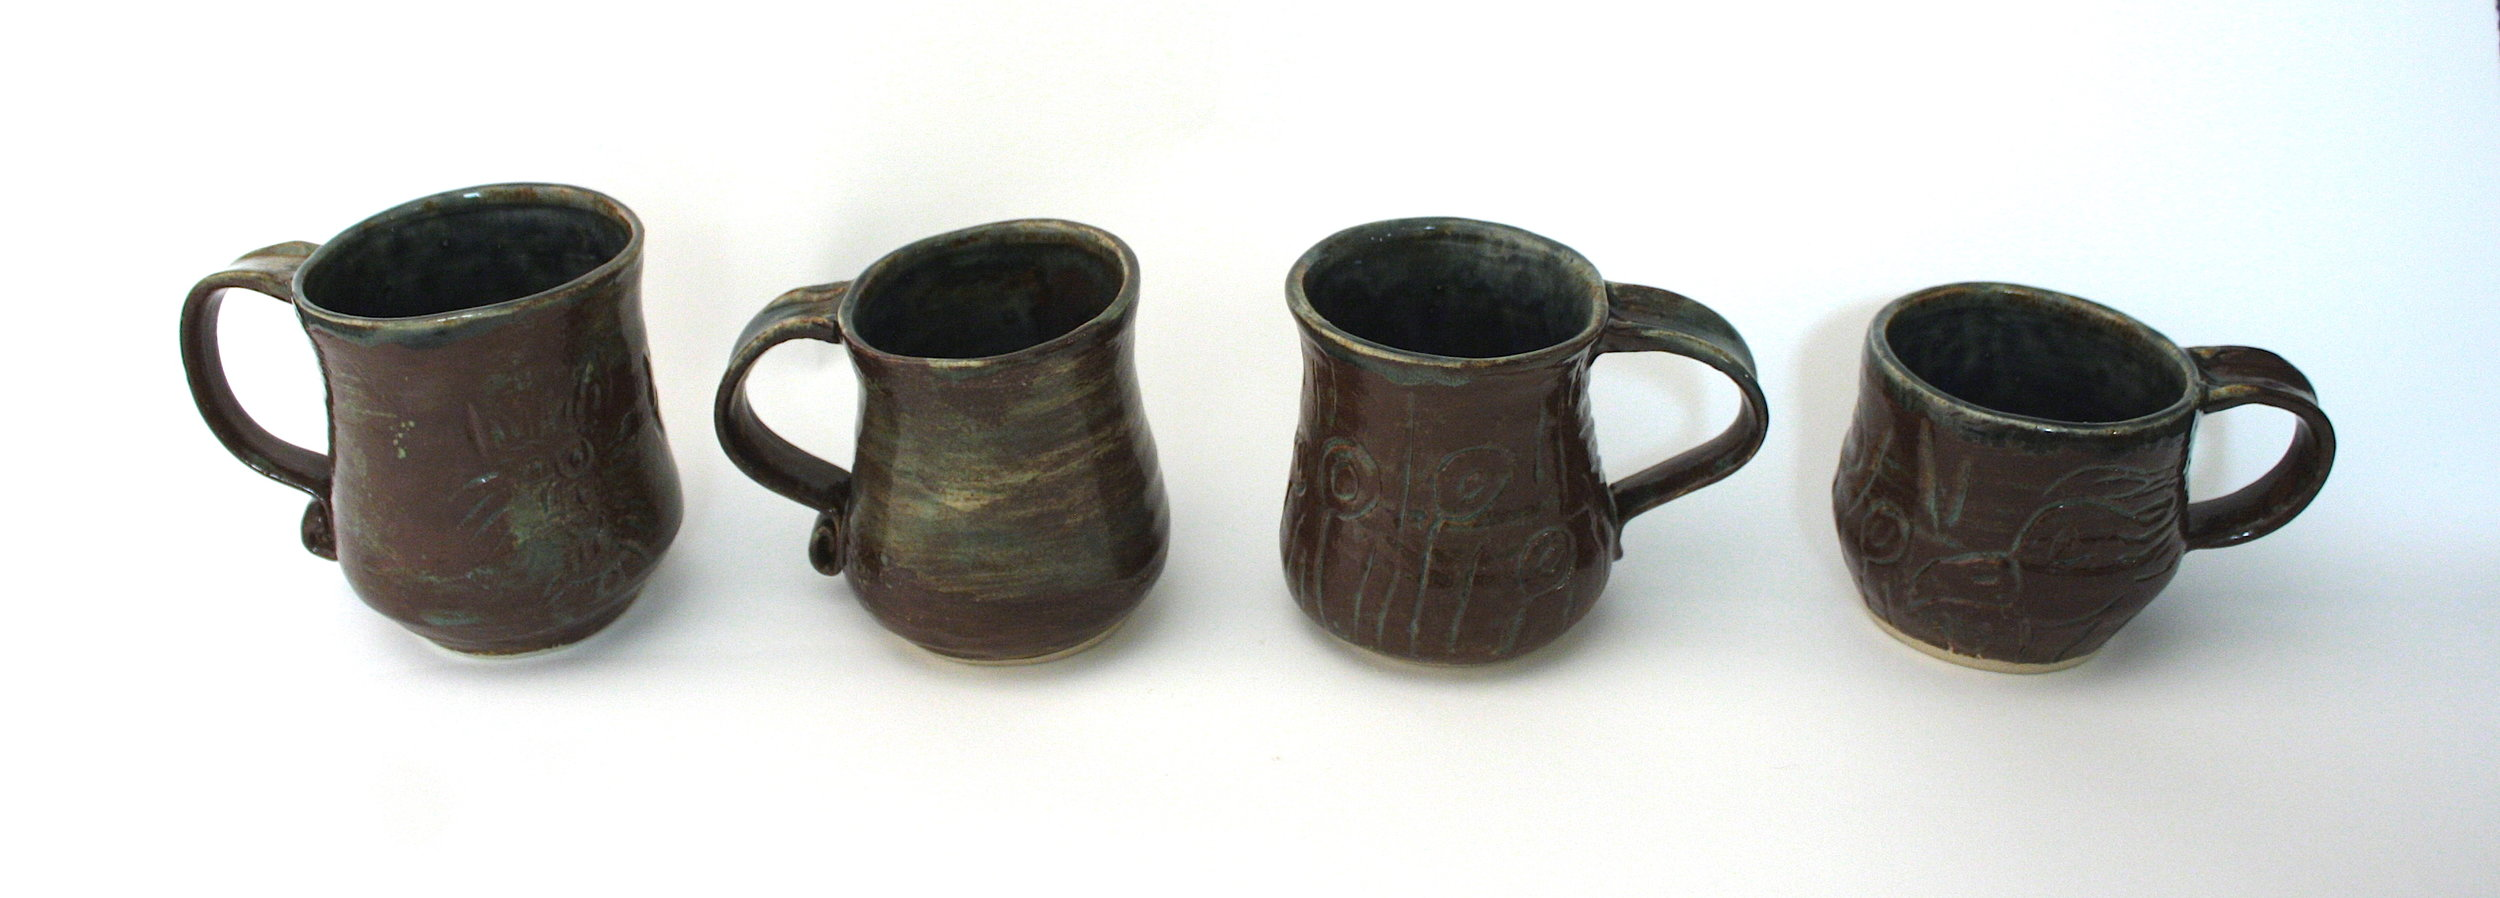 Pottery5May.JPG